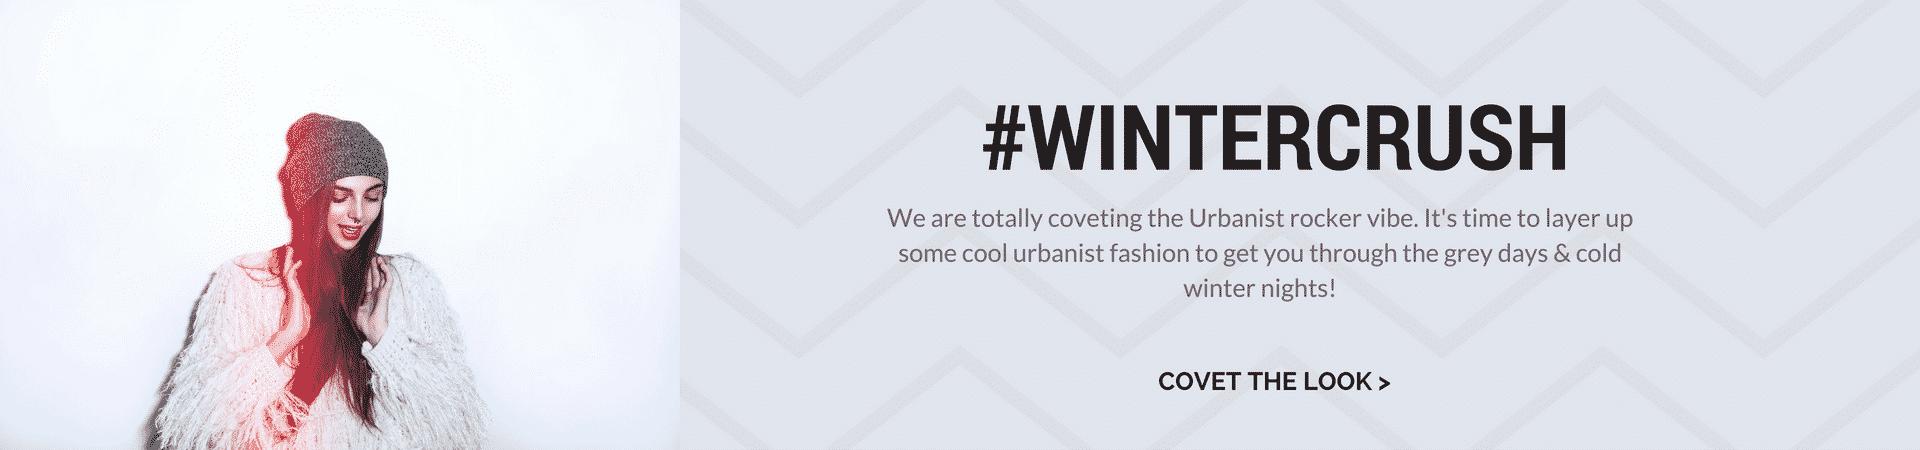 Covetboard WinterCrush Urbanist Collection